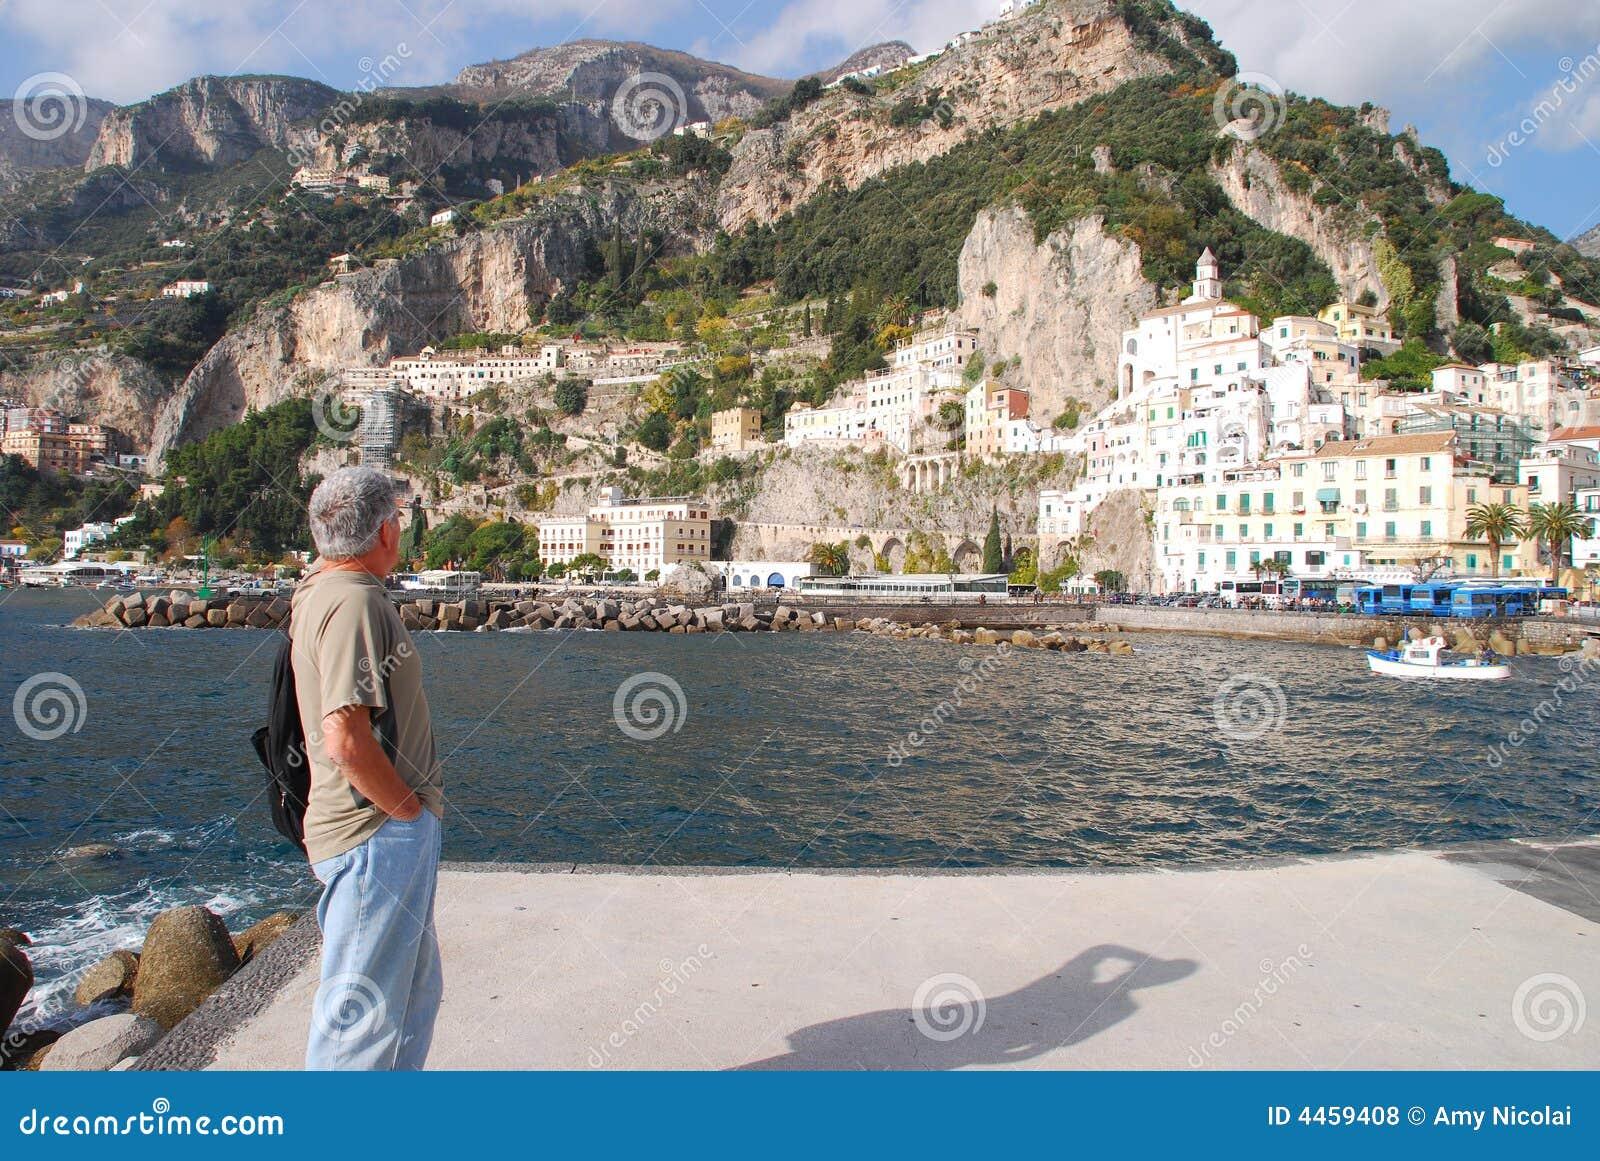 Man looks at Amalfi Italy